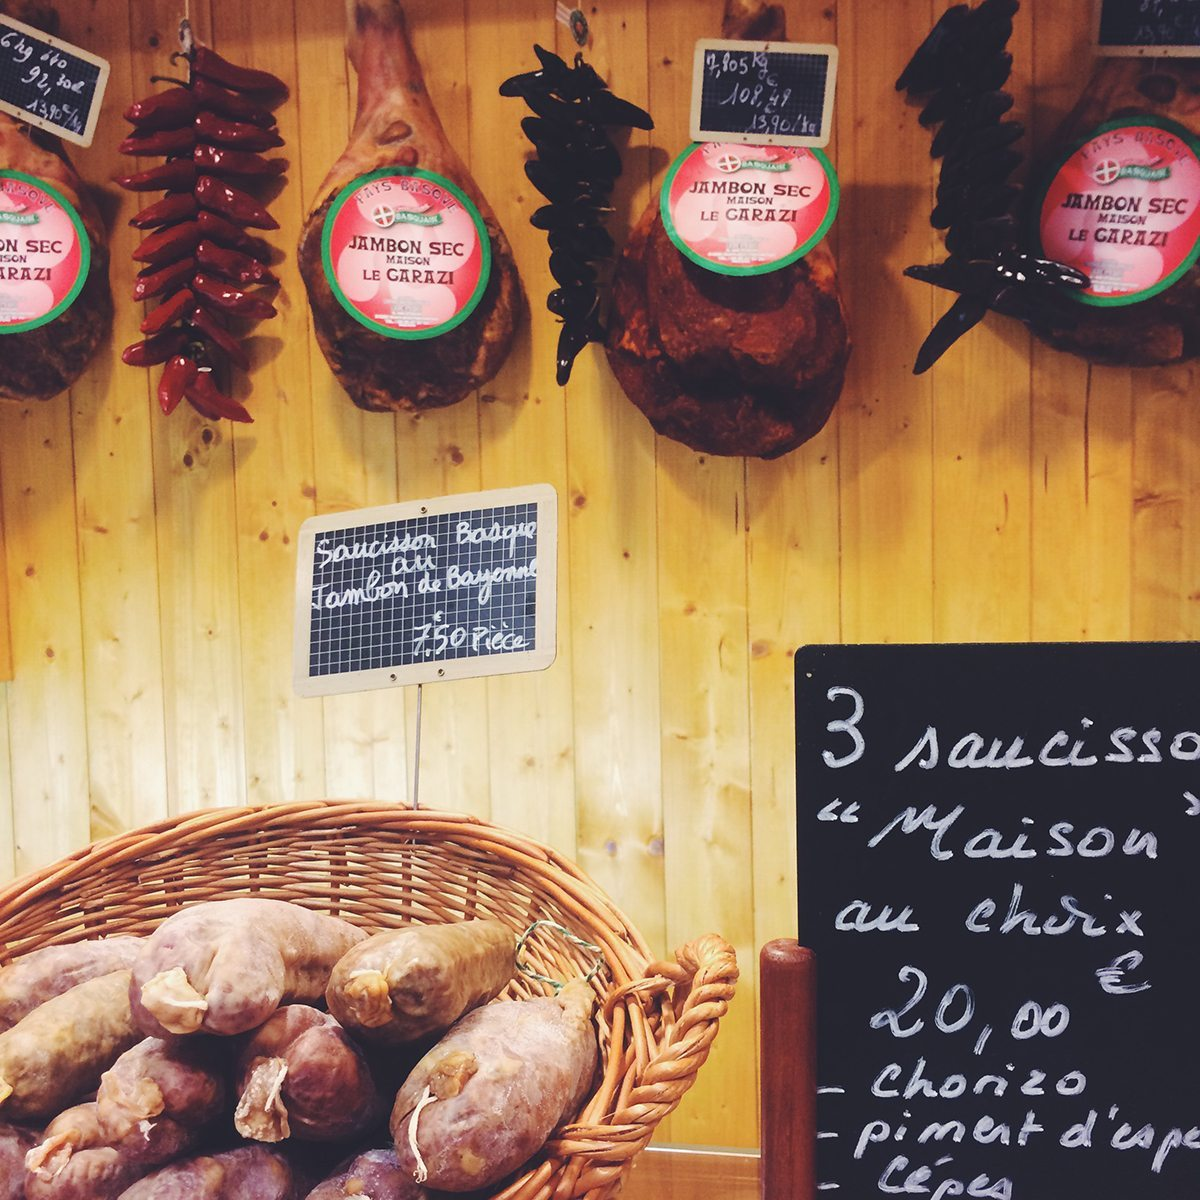 What food do you eat on Camino de Santiago